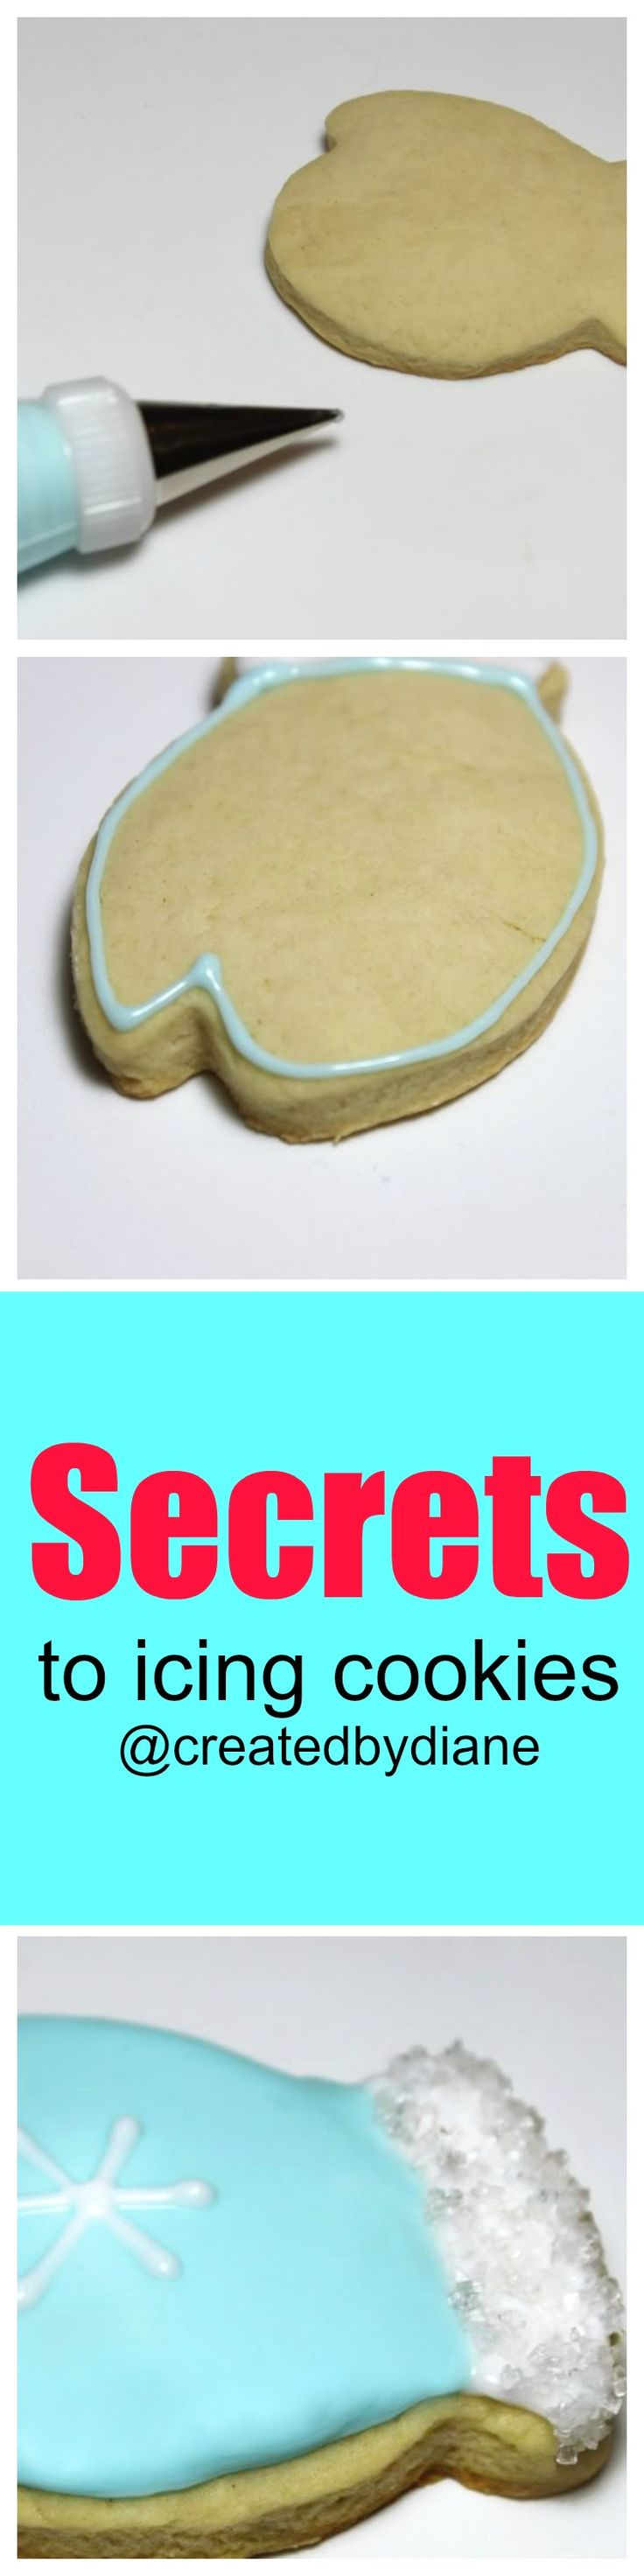 secrets to icing cookies @createdbydiane